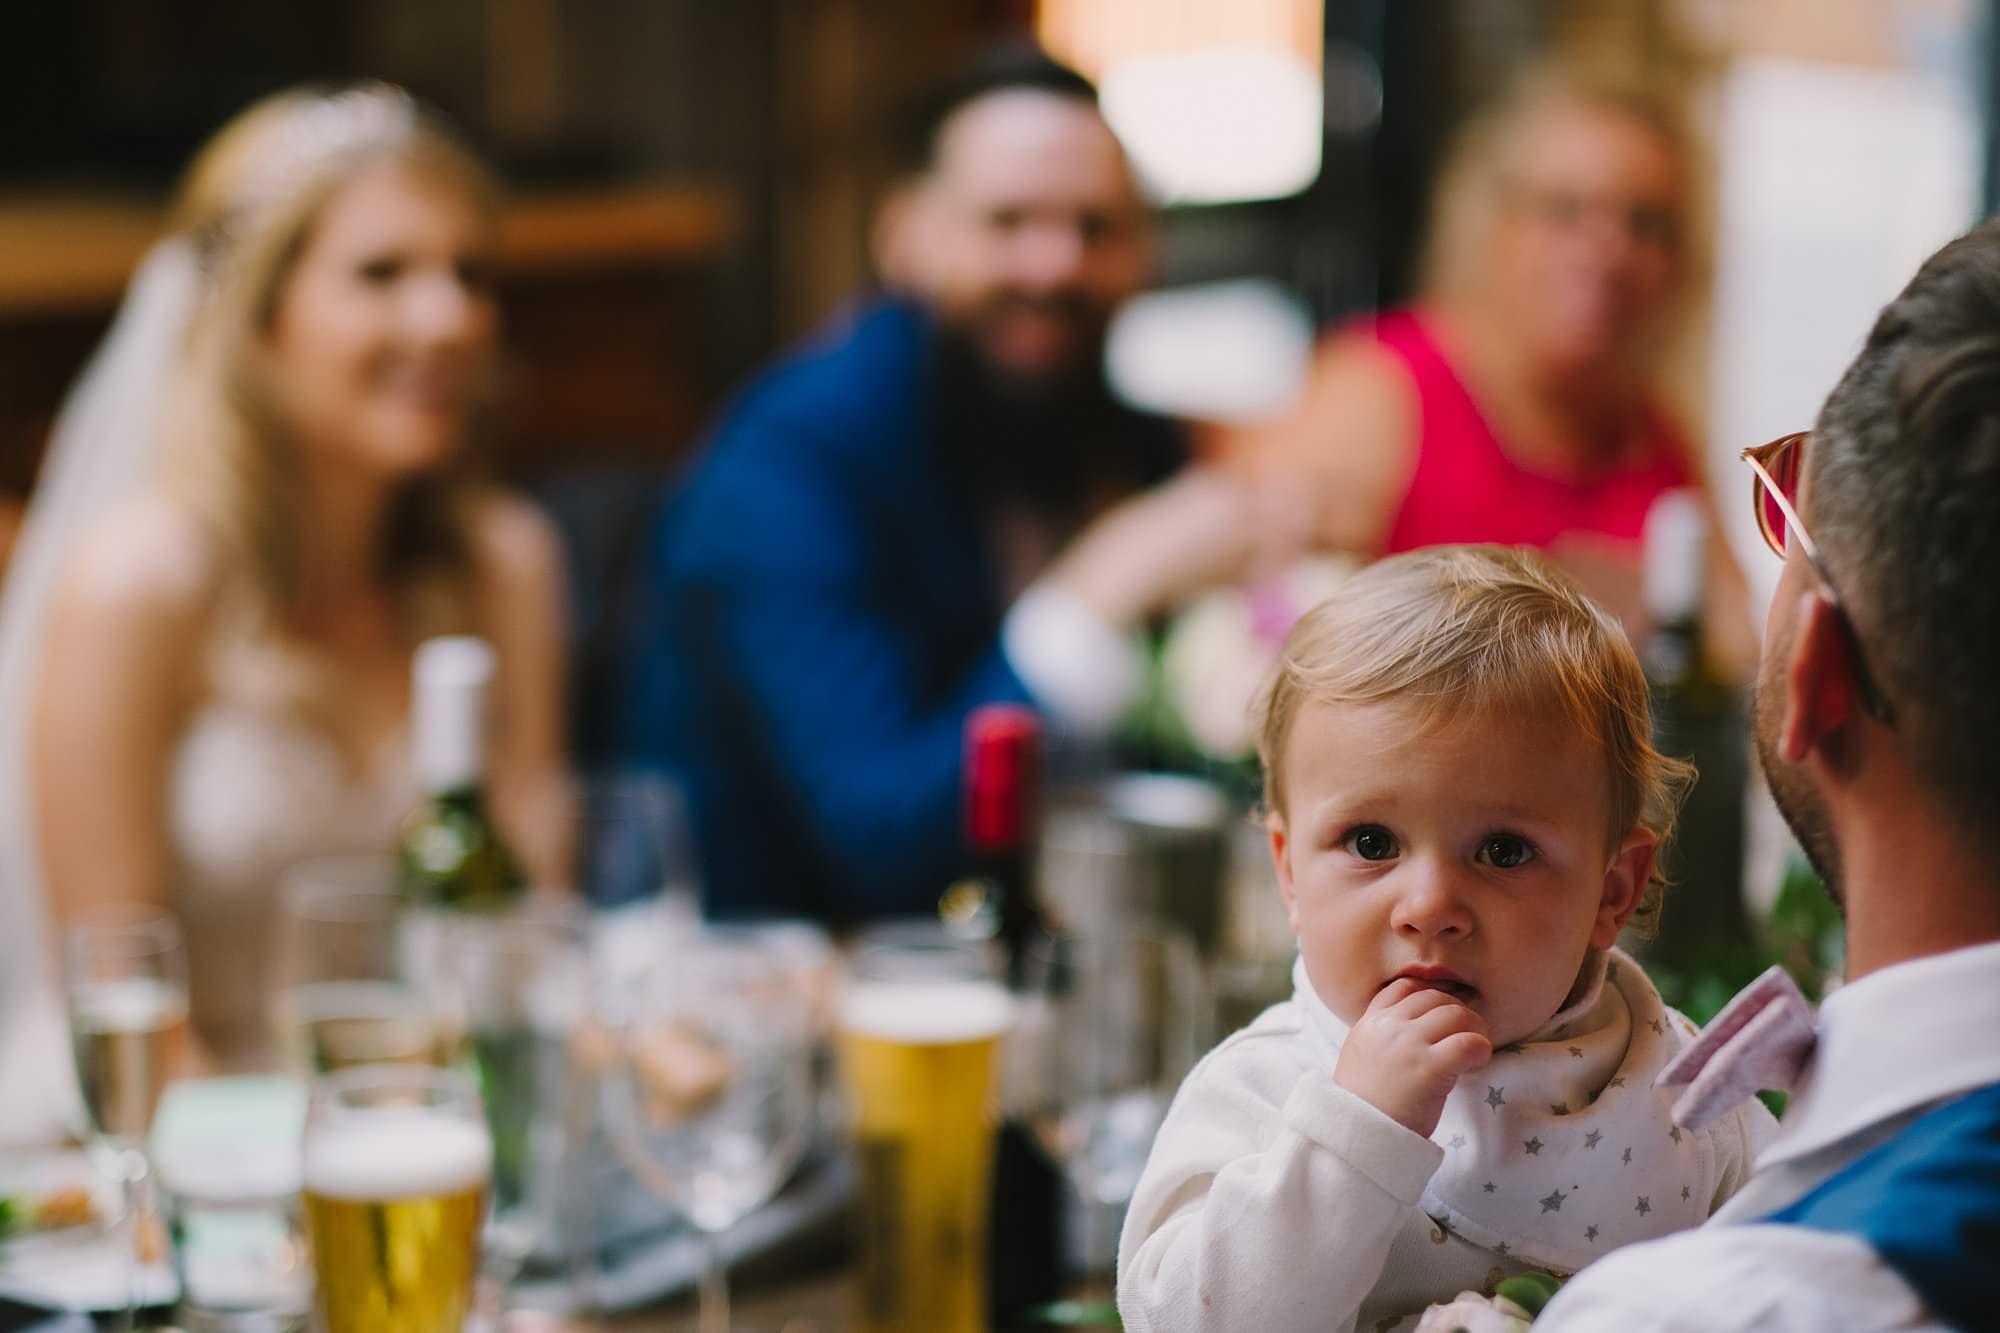 london pub wedding photographer jn 036 - The County Arms Wedding Photographer   Jen & Nick